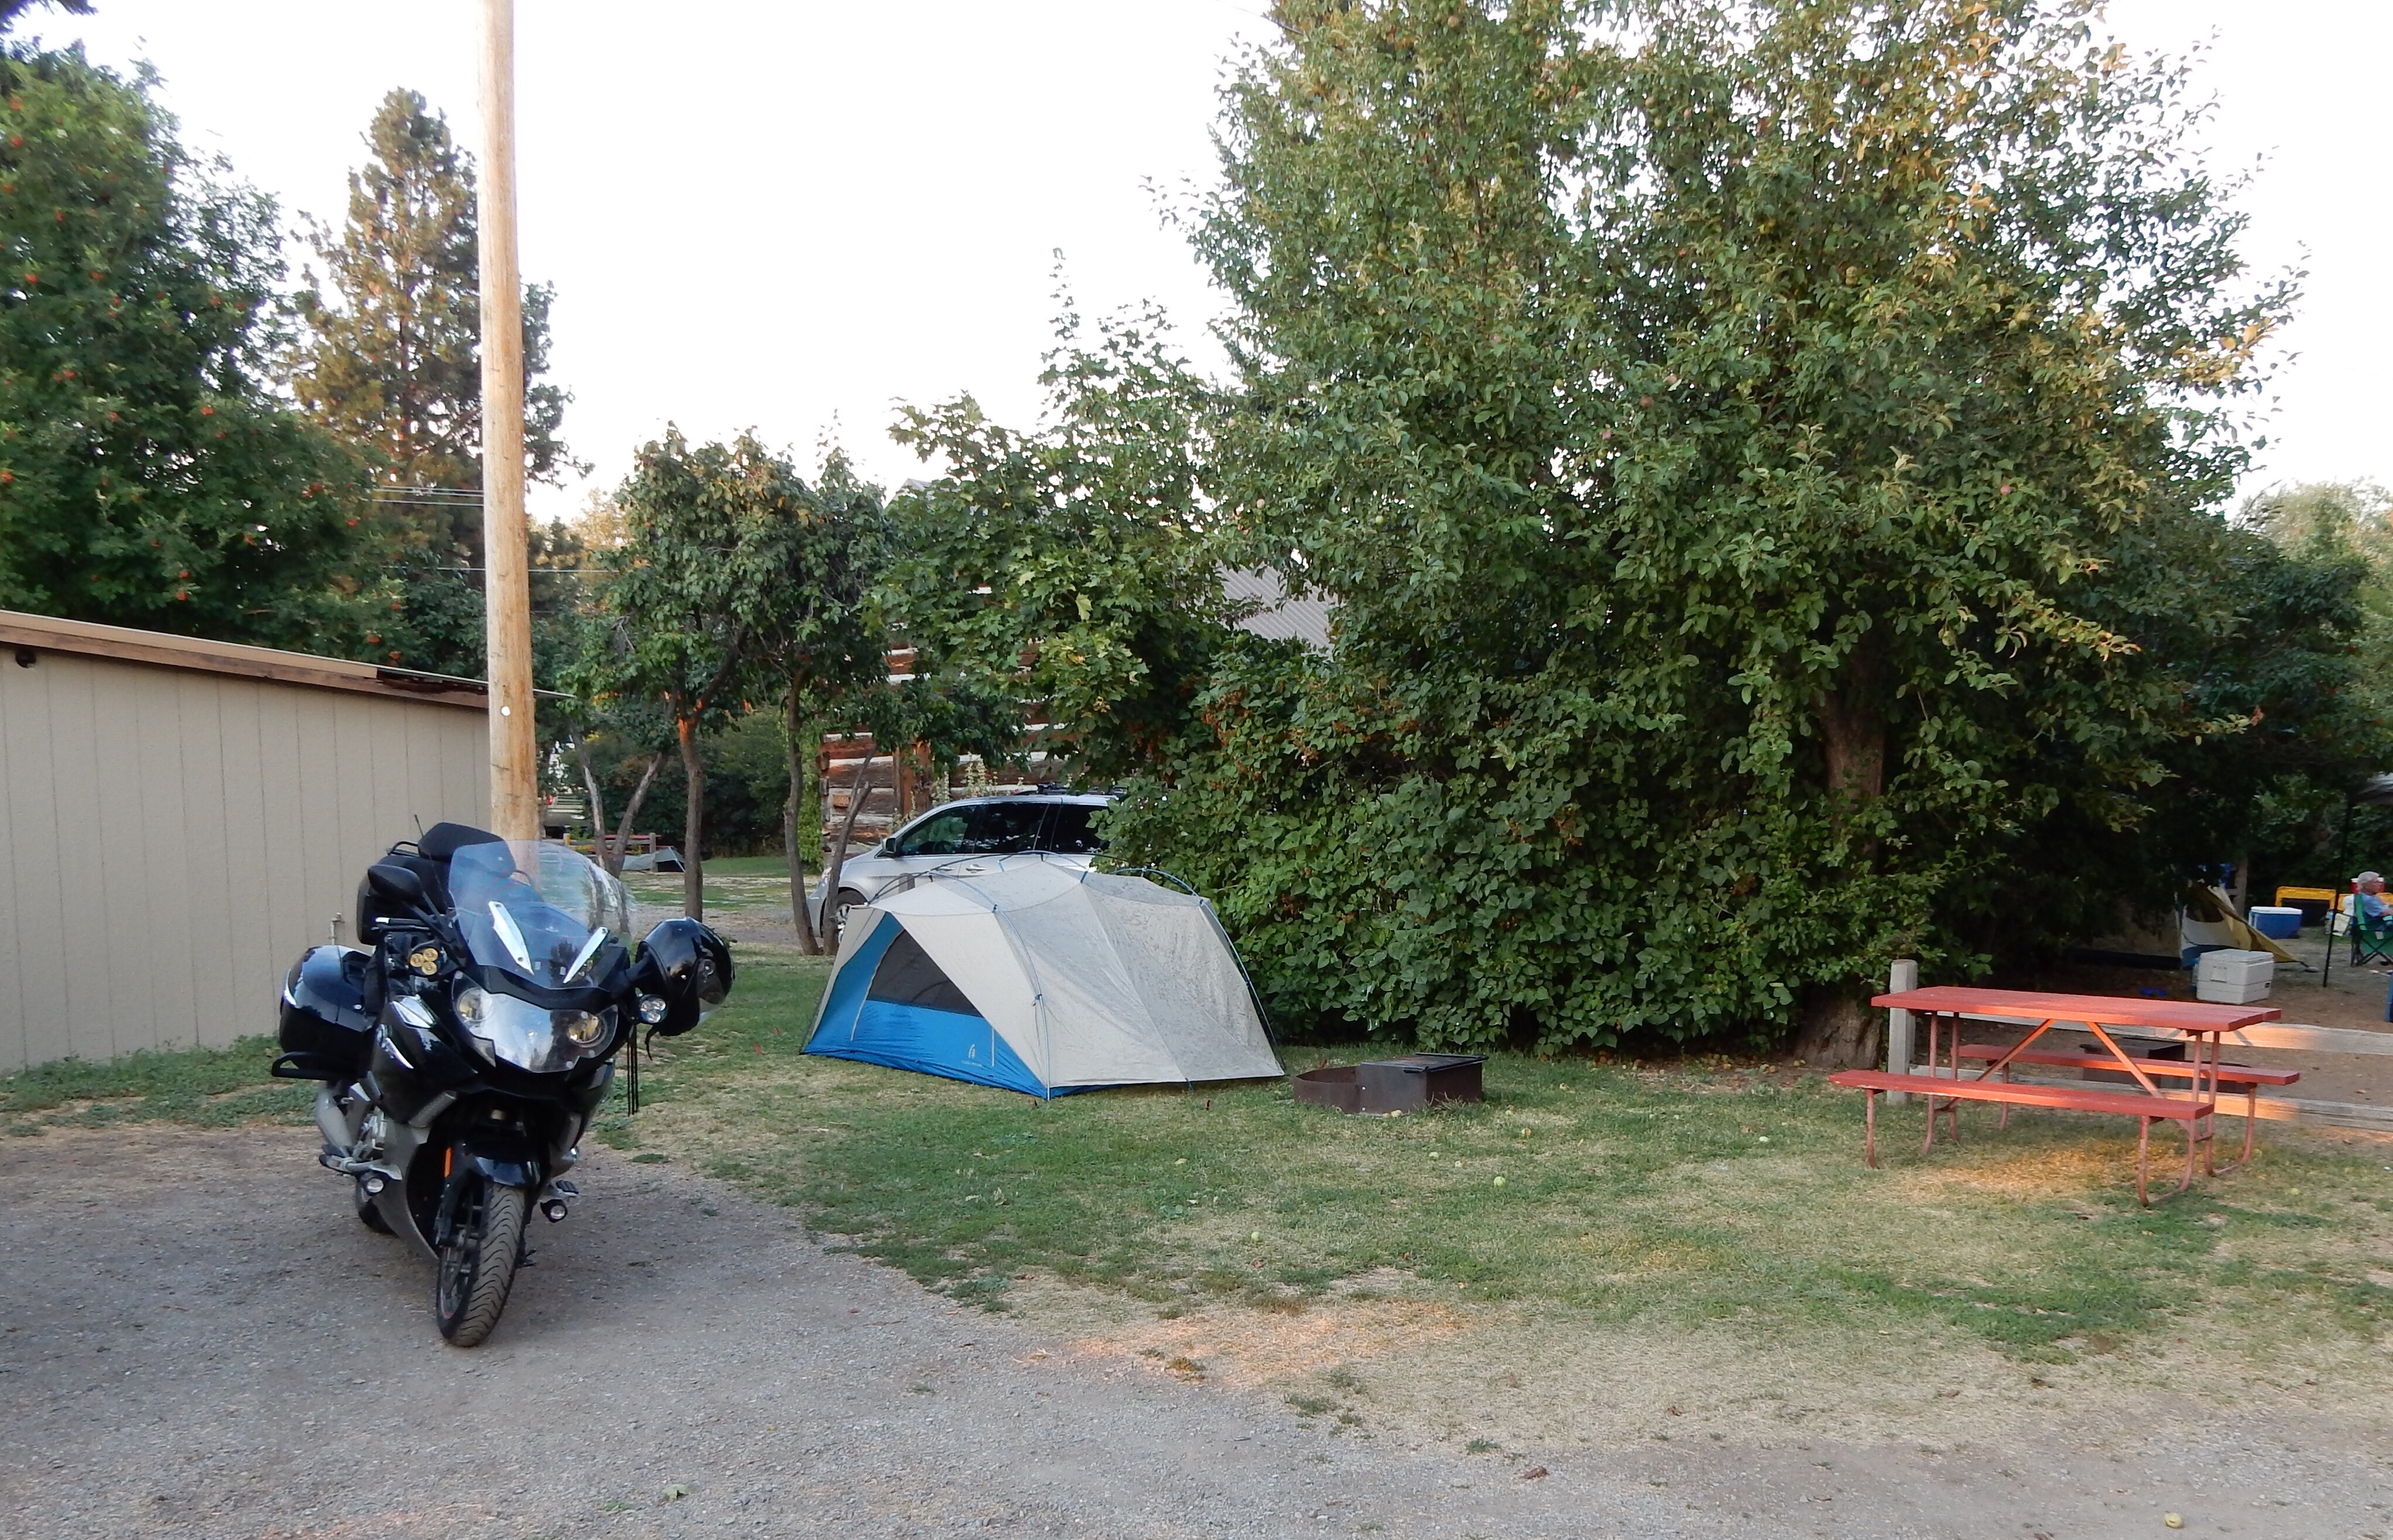 My campsite at the Missoula KOA.